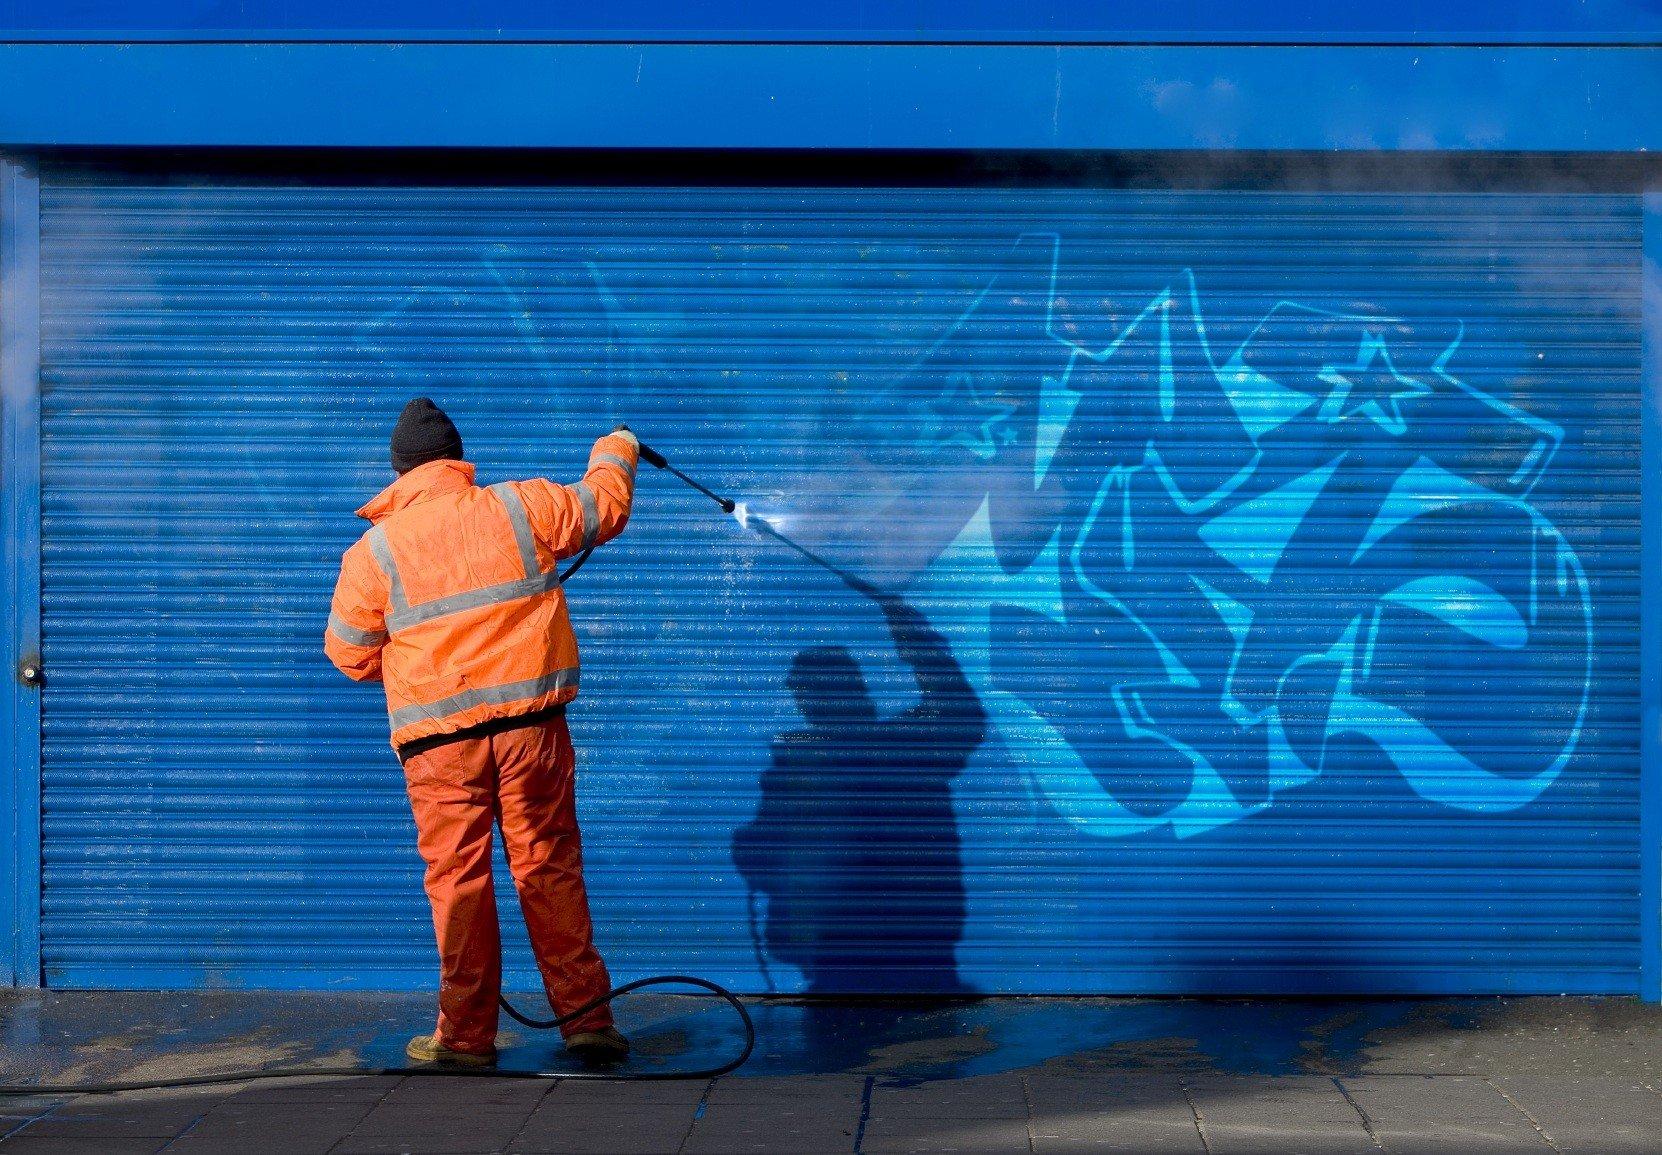 Graffiti Removal Process